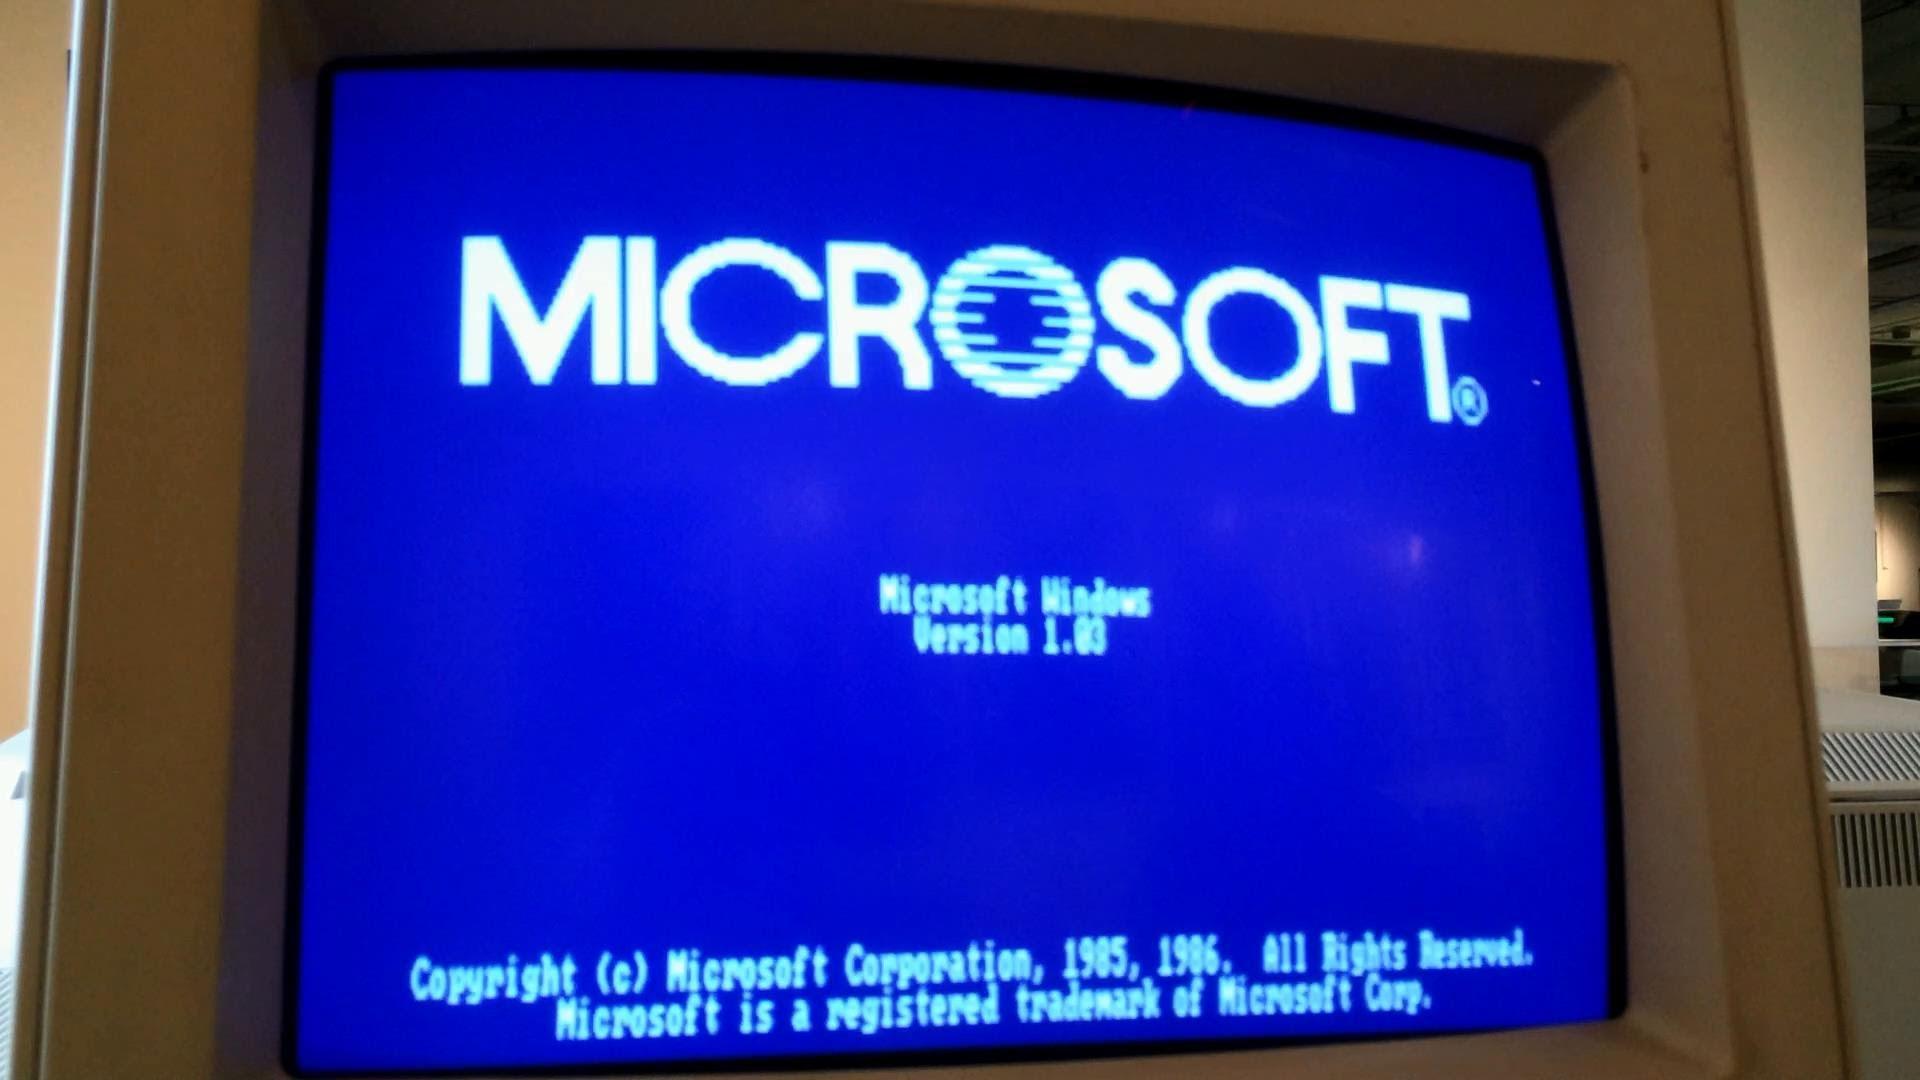 Microsoft Windows 1.03